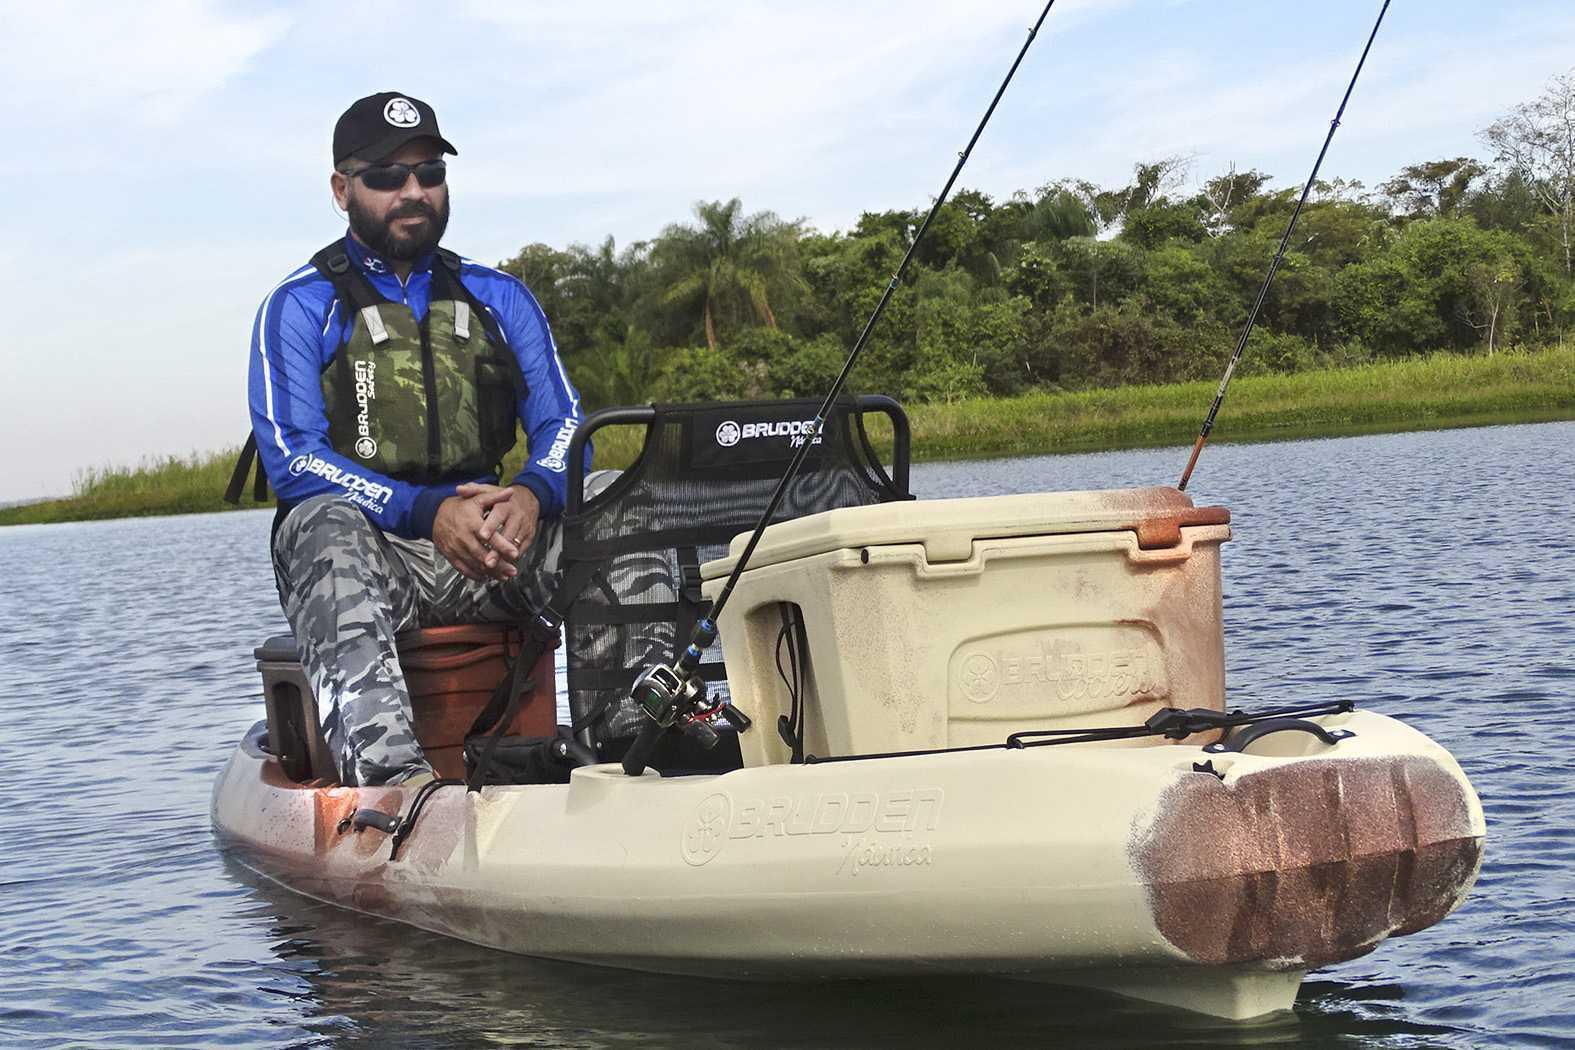 Caiaque para Pesca Brudden Náutica Combat Fishing Profissional Trio Woods Marrom/Bege